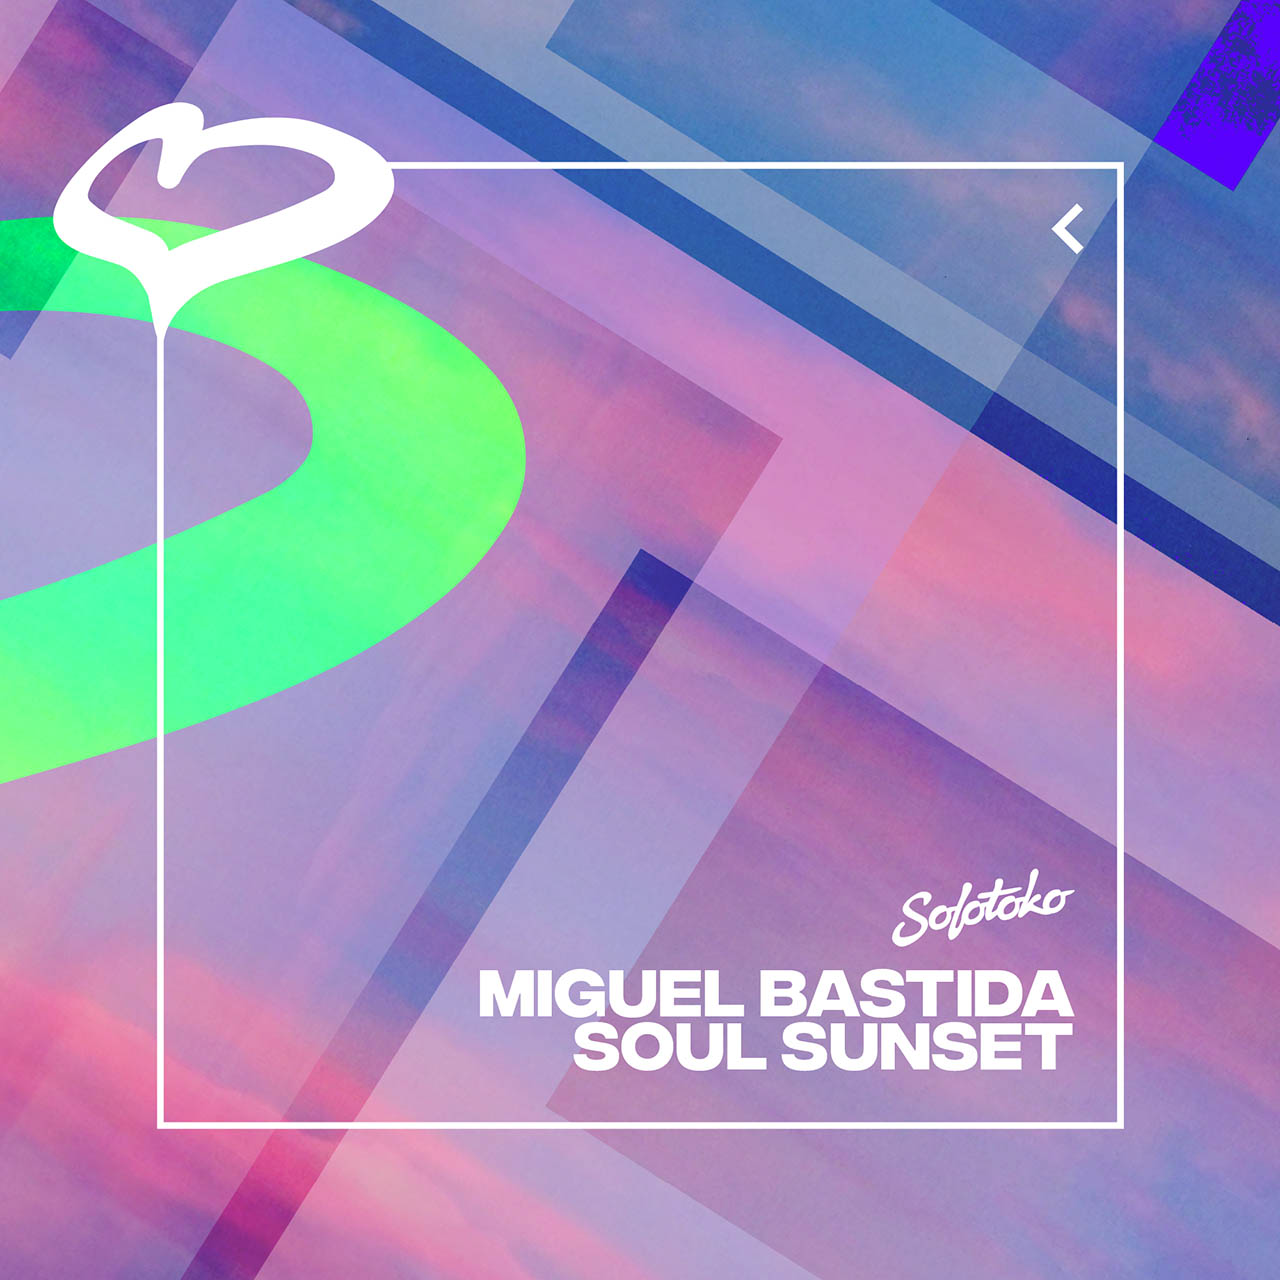 Miguel Bastida - Soul Sunset